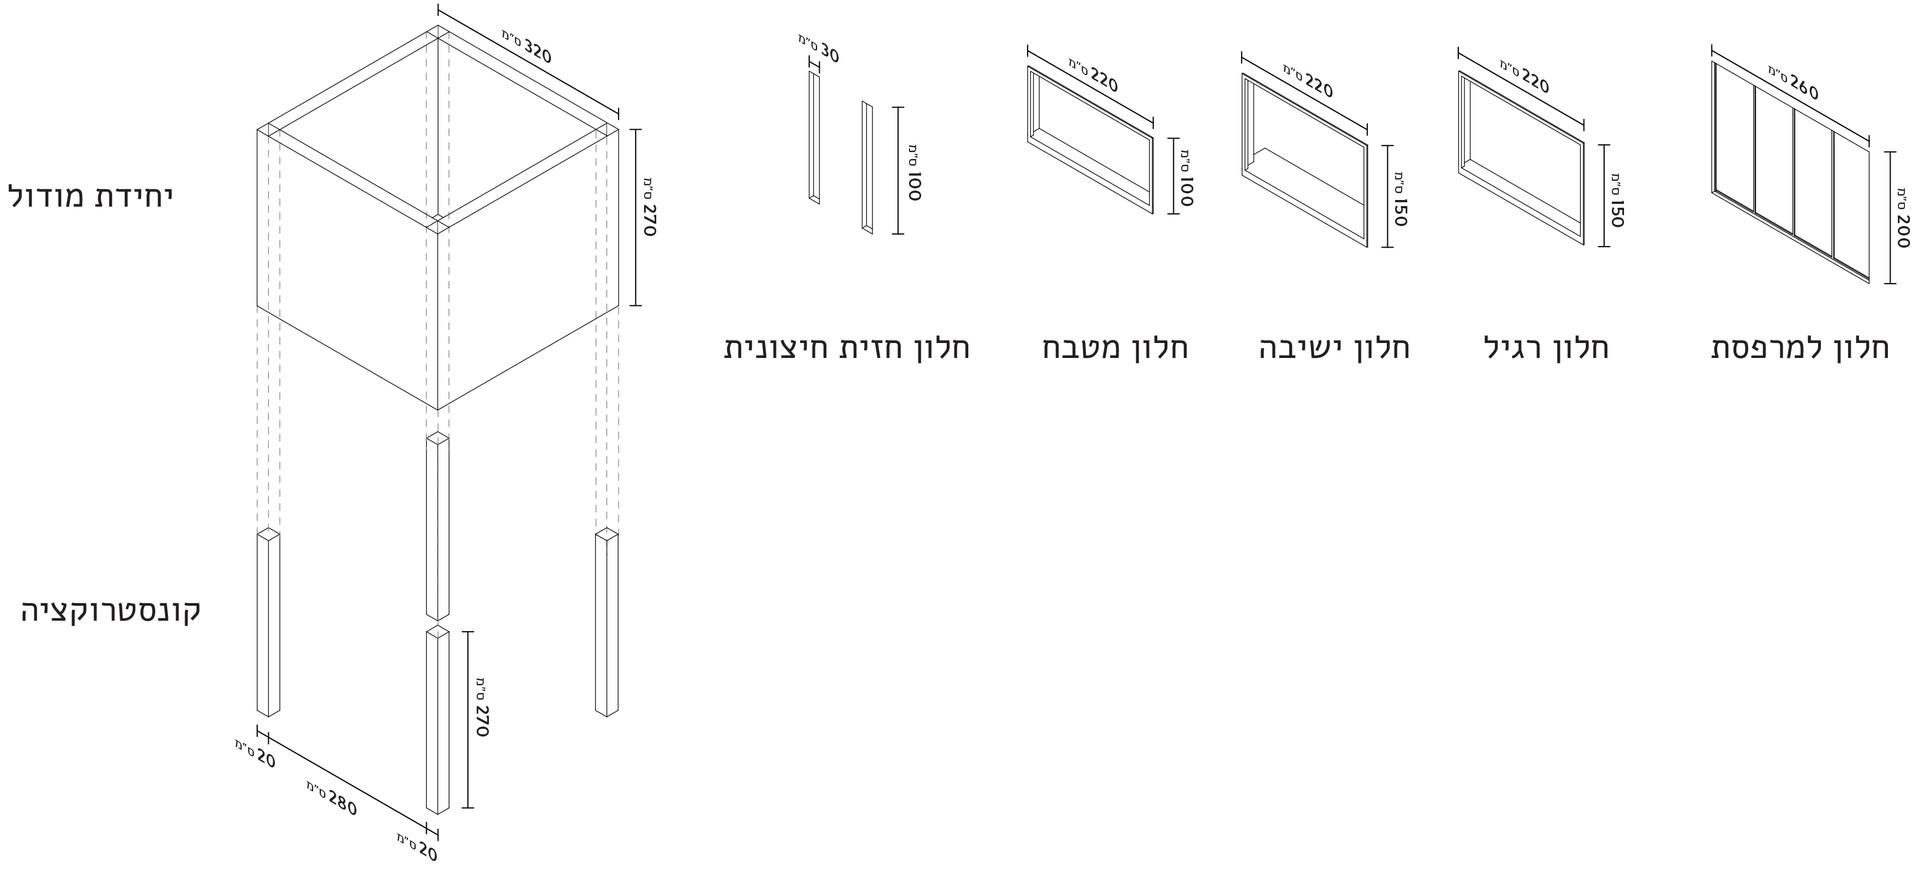 windows catalog 2.jpg